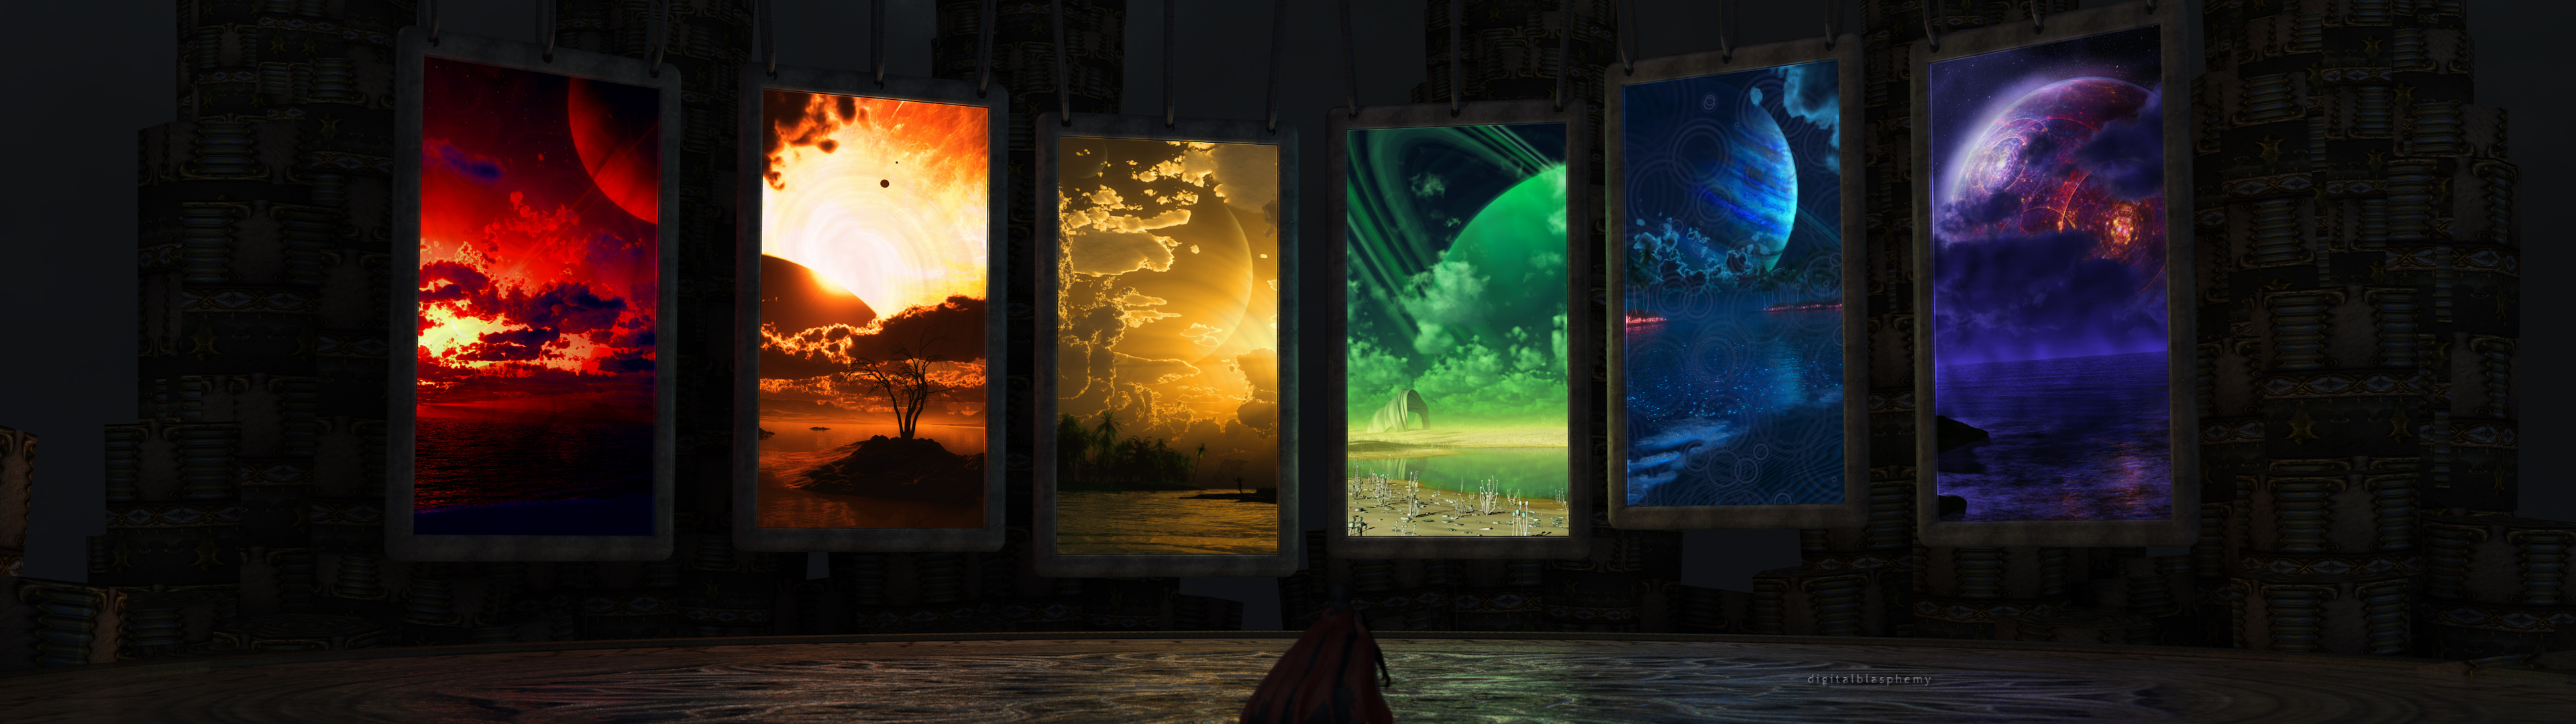 Sci Fi Computer Wallpapers Desktop Backgrounds 3840x1080 ID 3840x1080